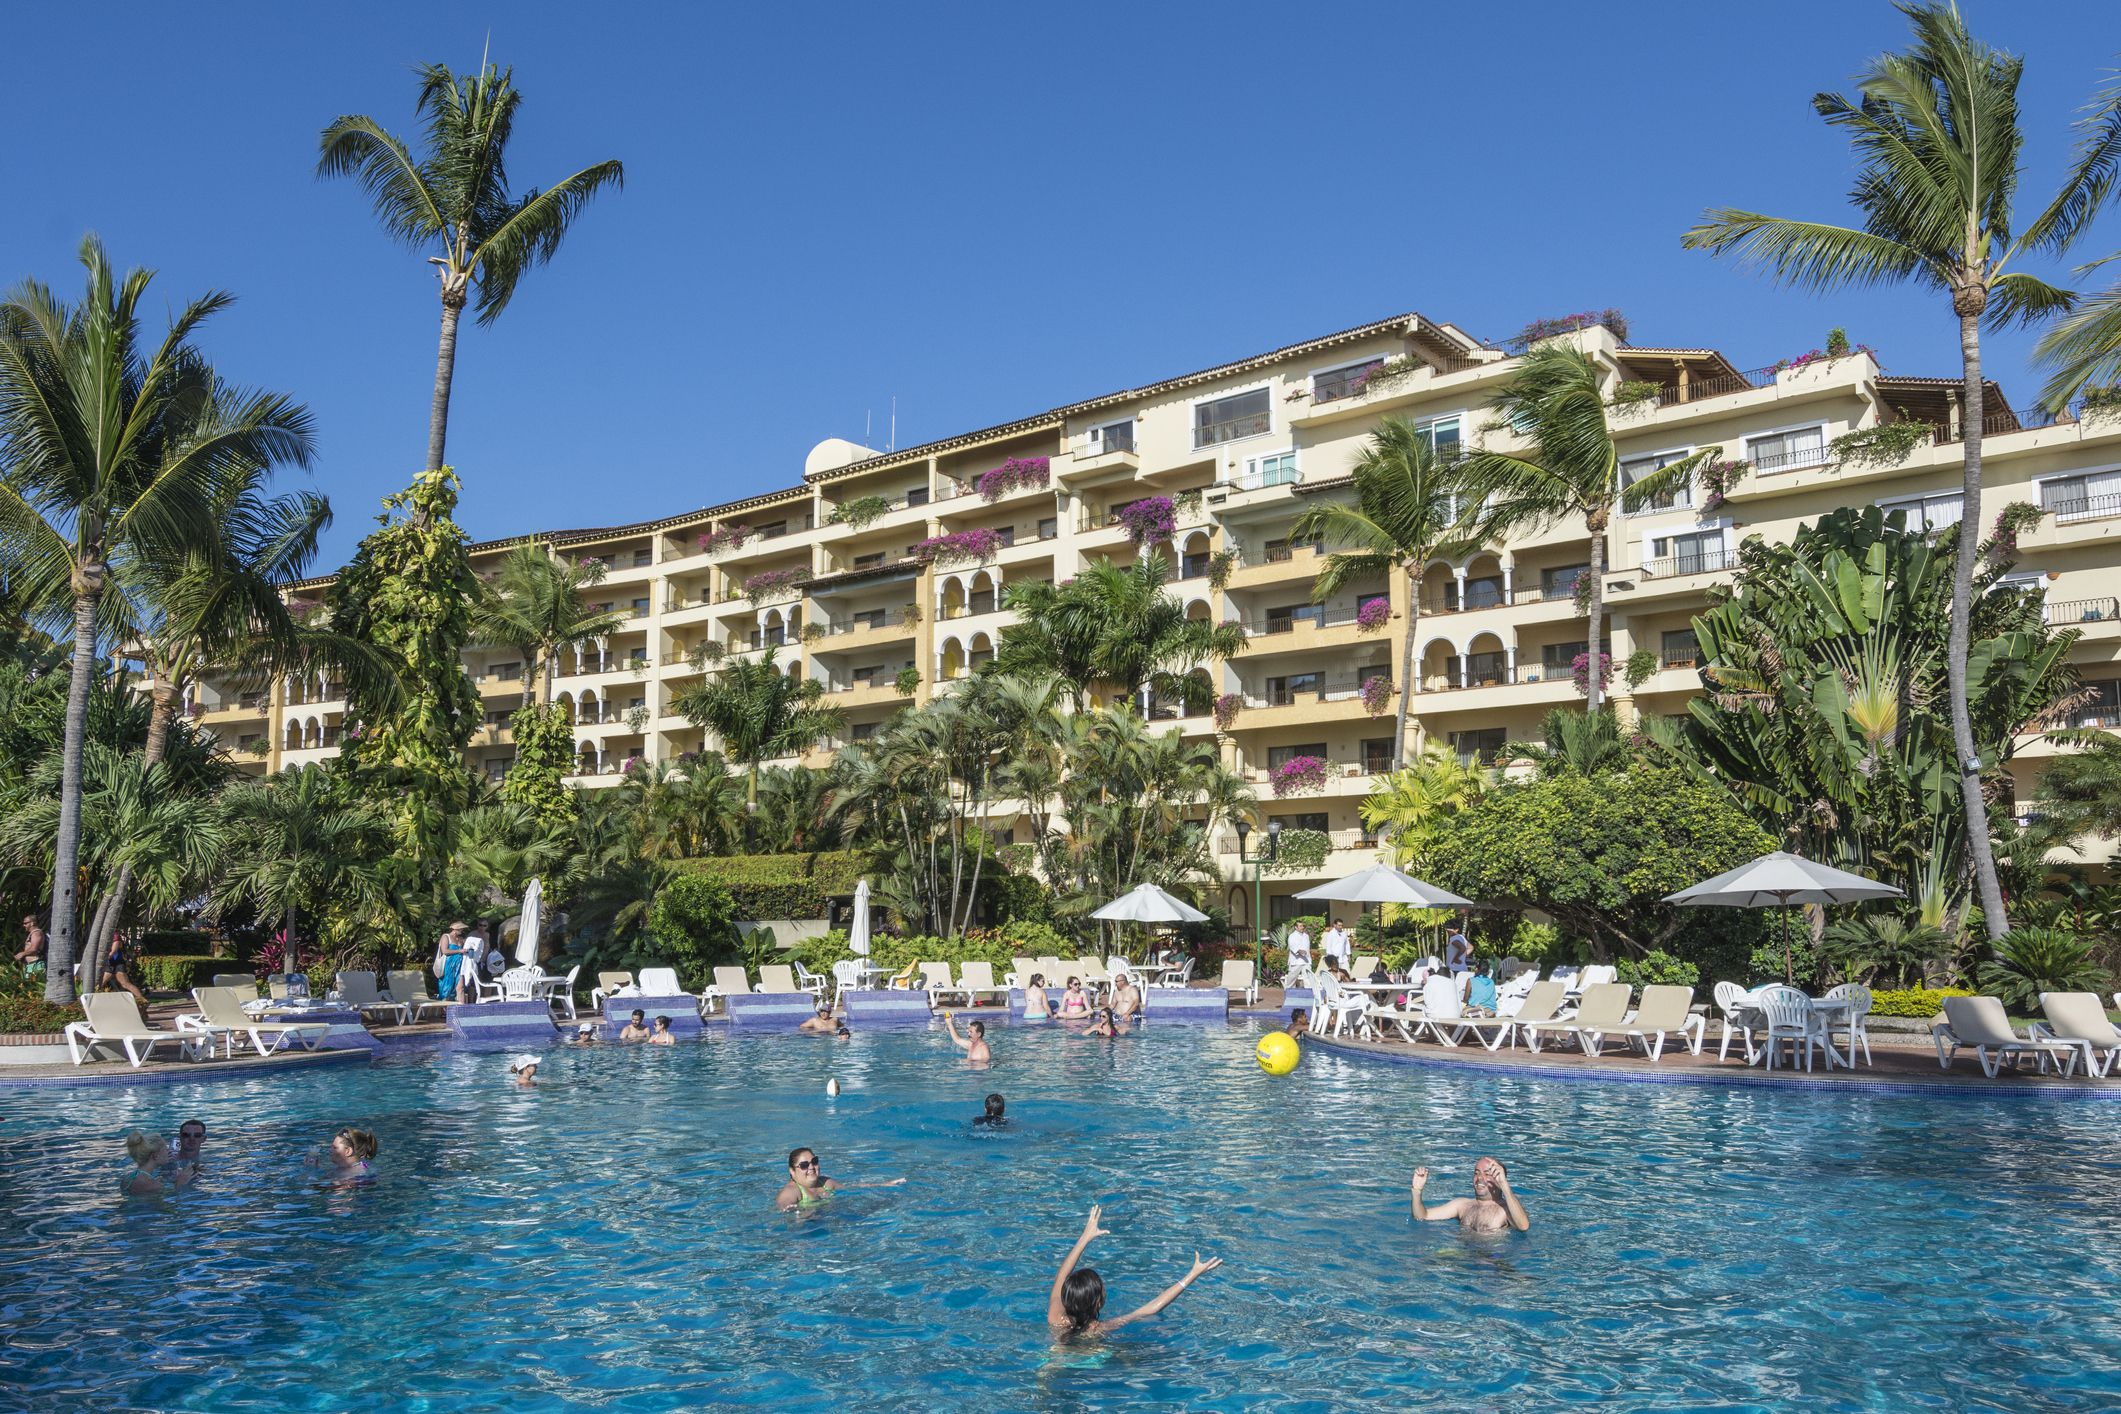 Best Value AllInclusive Resorts For Families - All inclusive resorts in puerto vallarta